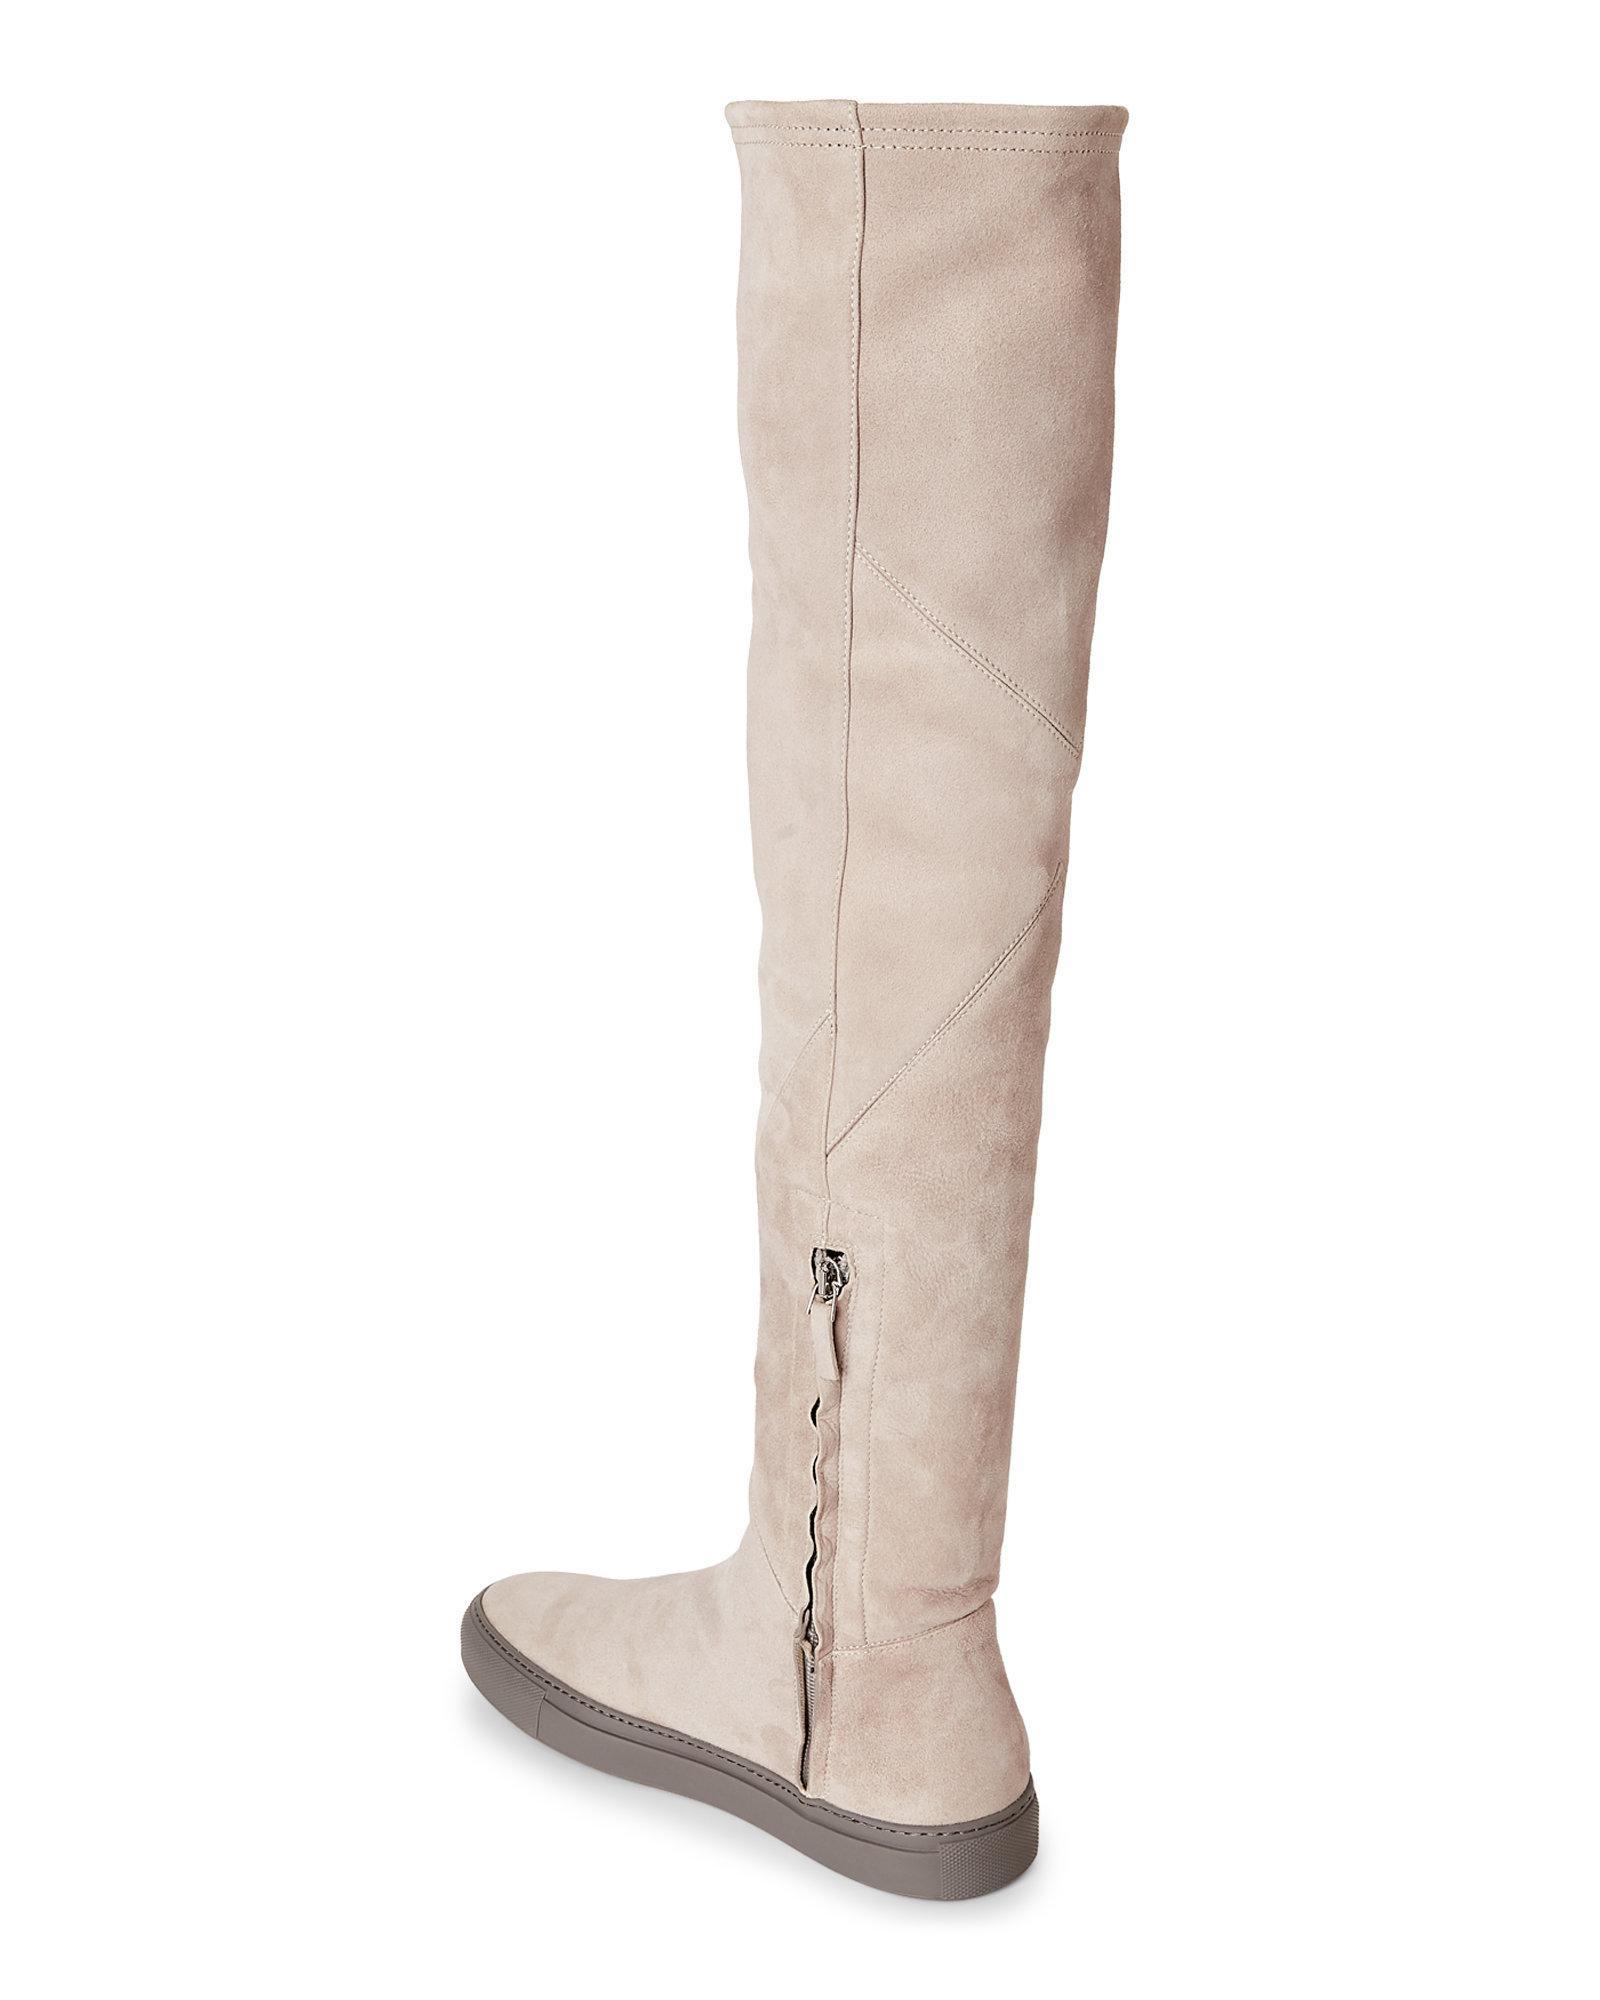 Suede Lyst The Grey Knee In Boots Over Francesca Filippi Fabiana Gray waxwR0g6